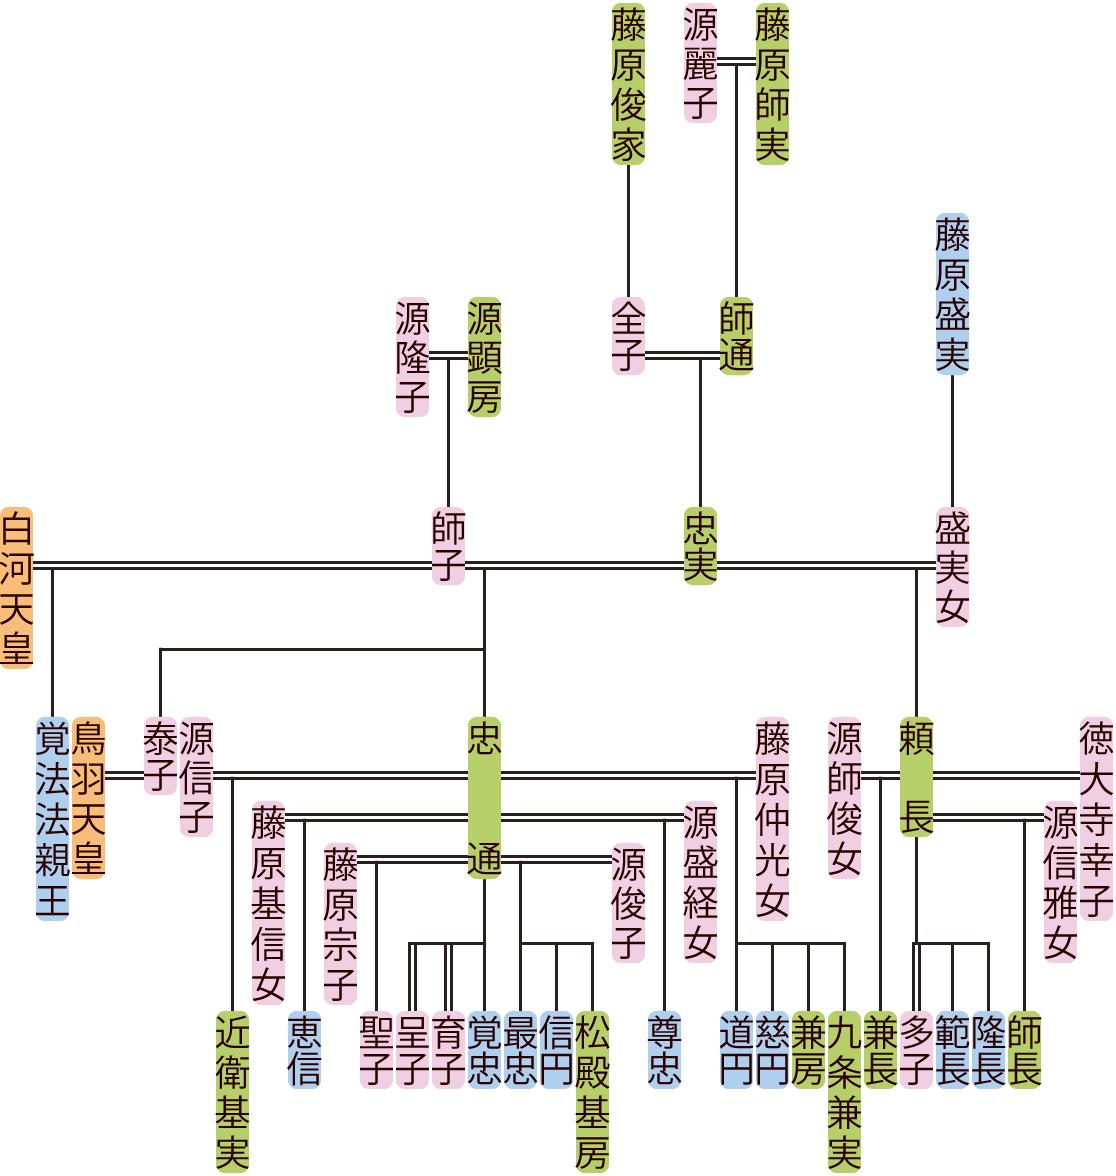 藤原忠実の系図